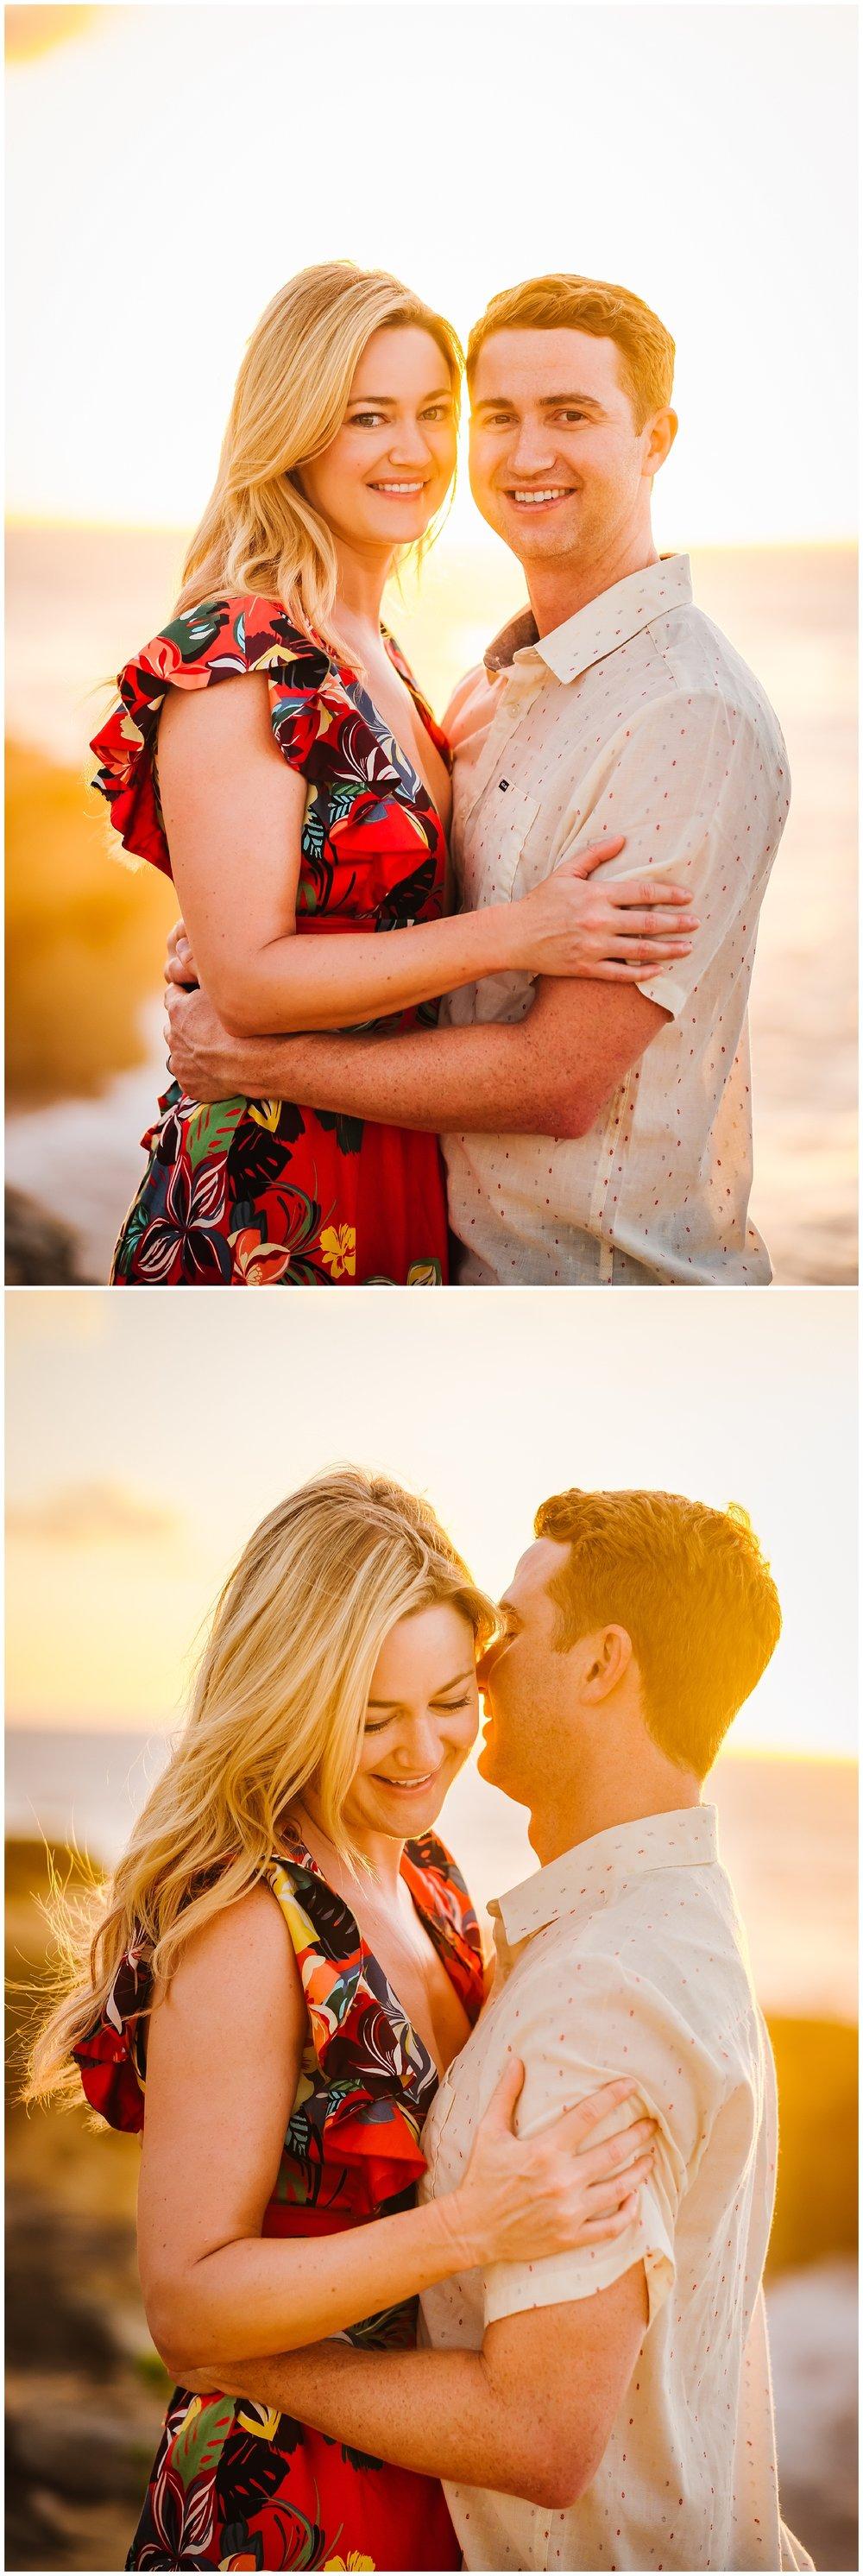 hawaiin-honeymoon-sunrise-portraits-kauai-grand-hystt-destination-photographer_0004.jpg